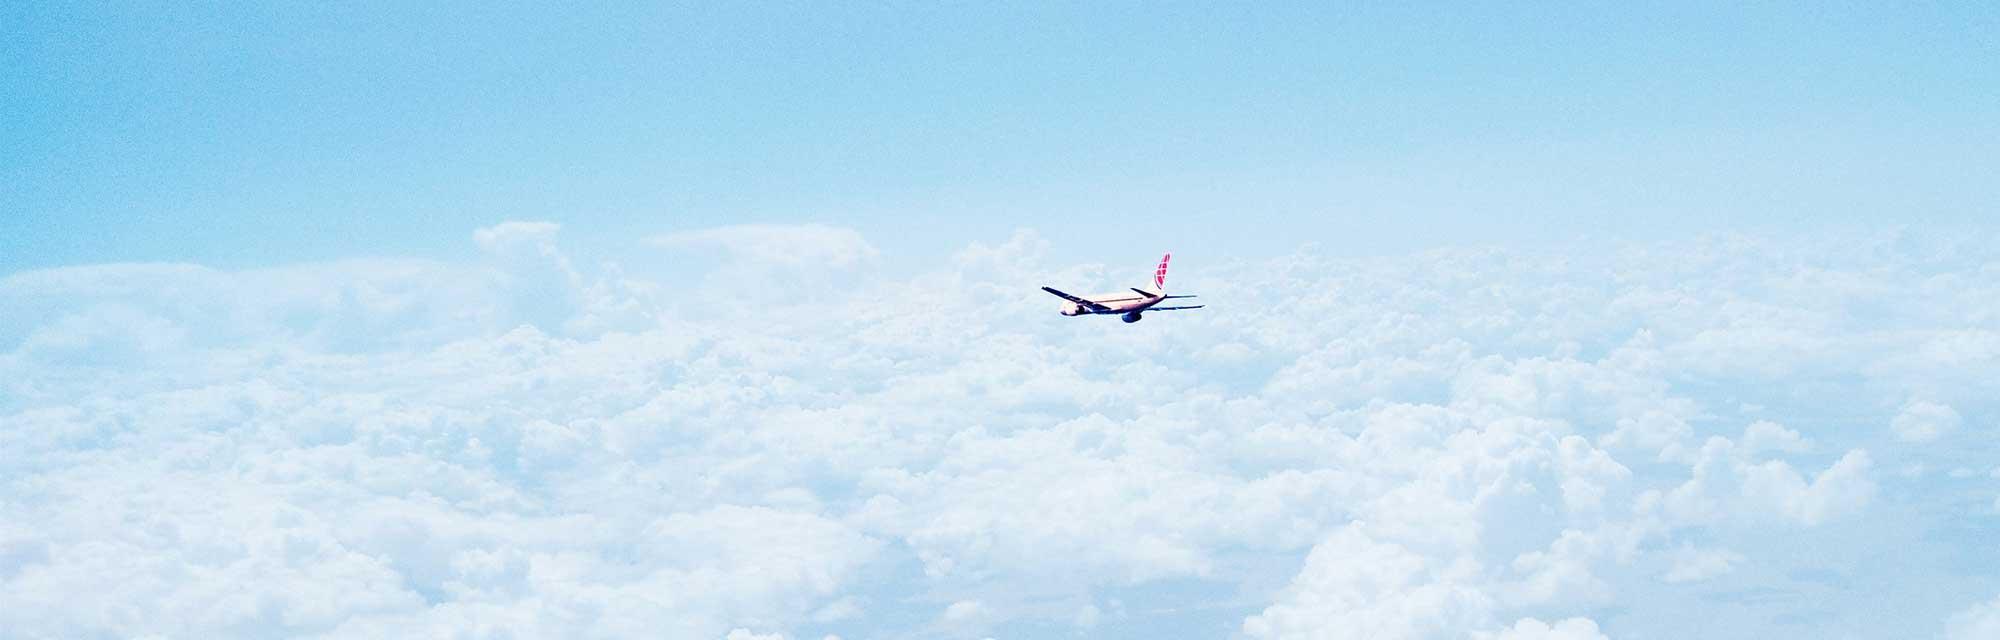 airplane flying in blue sky